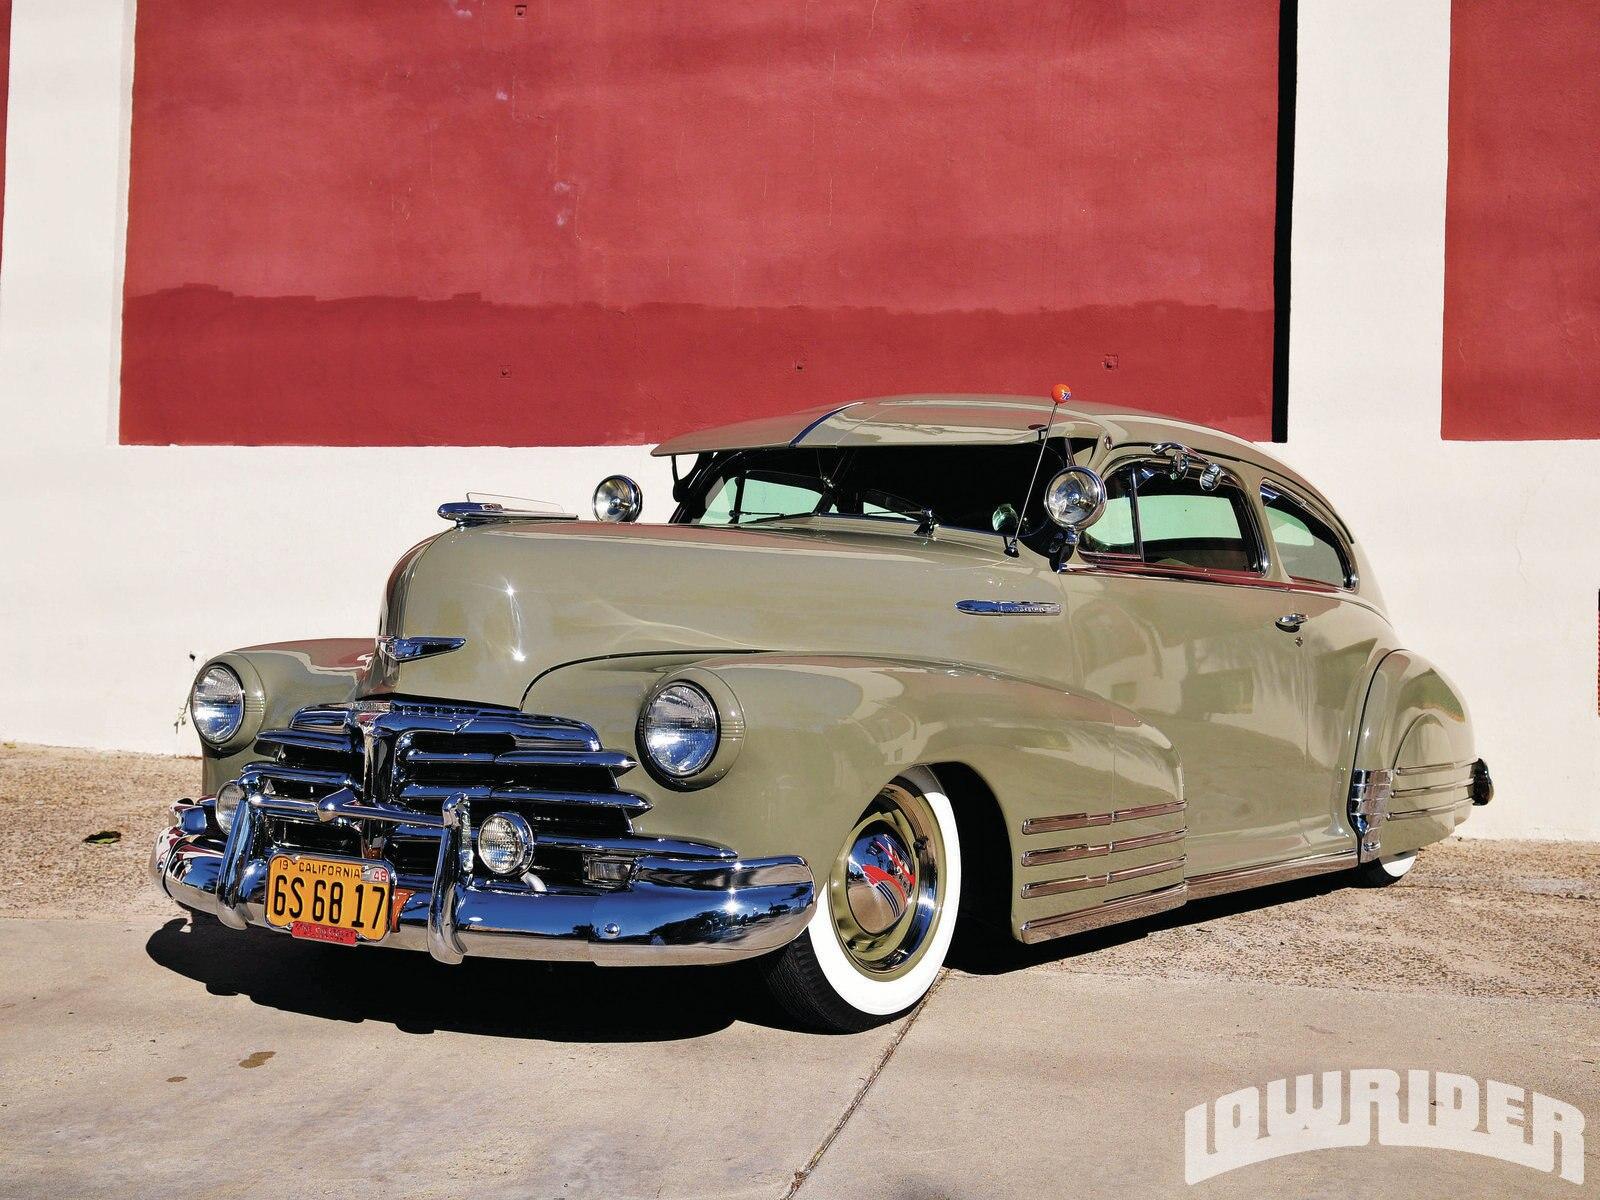 1948 Chevrolet Fleetline - Lowrider Magazine